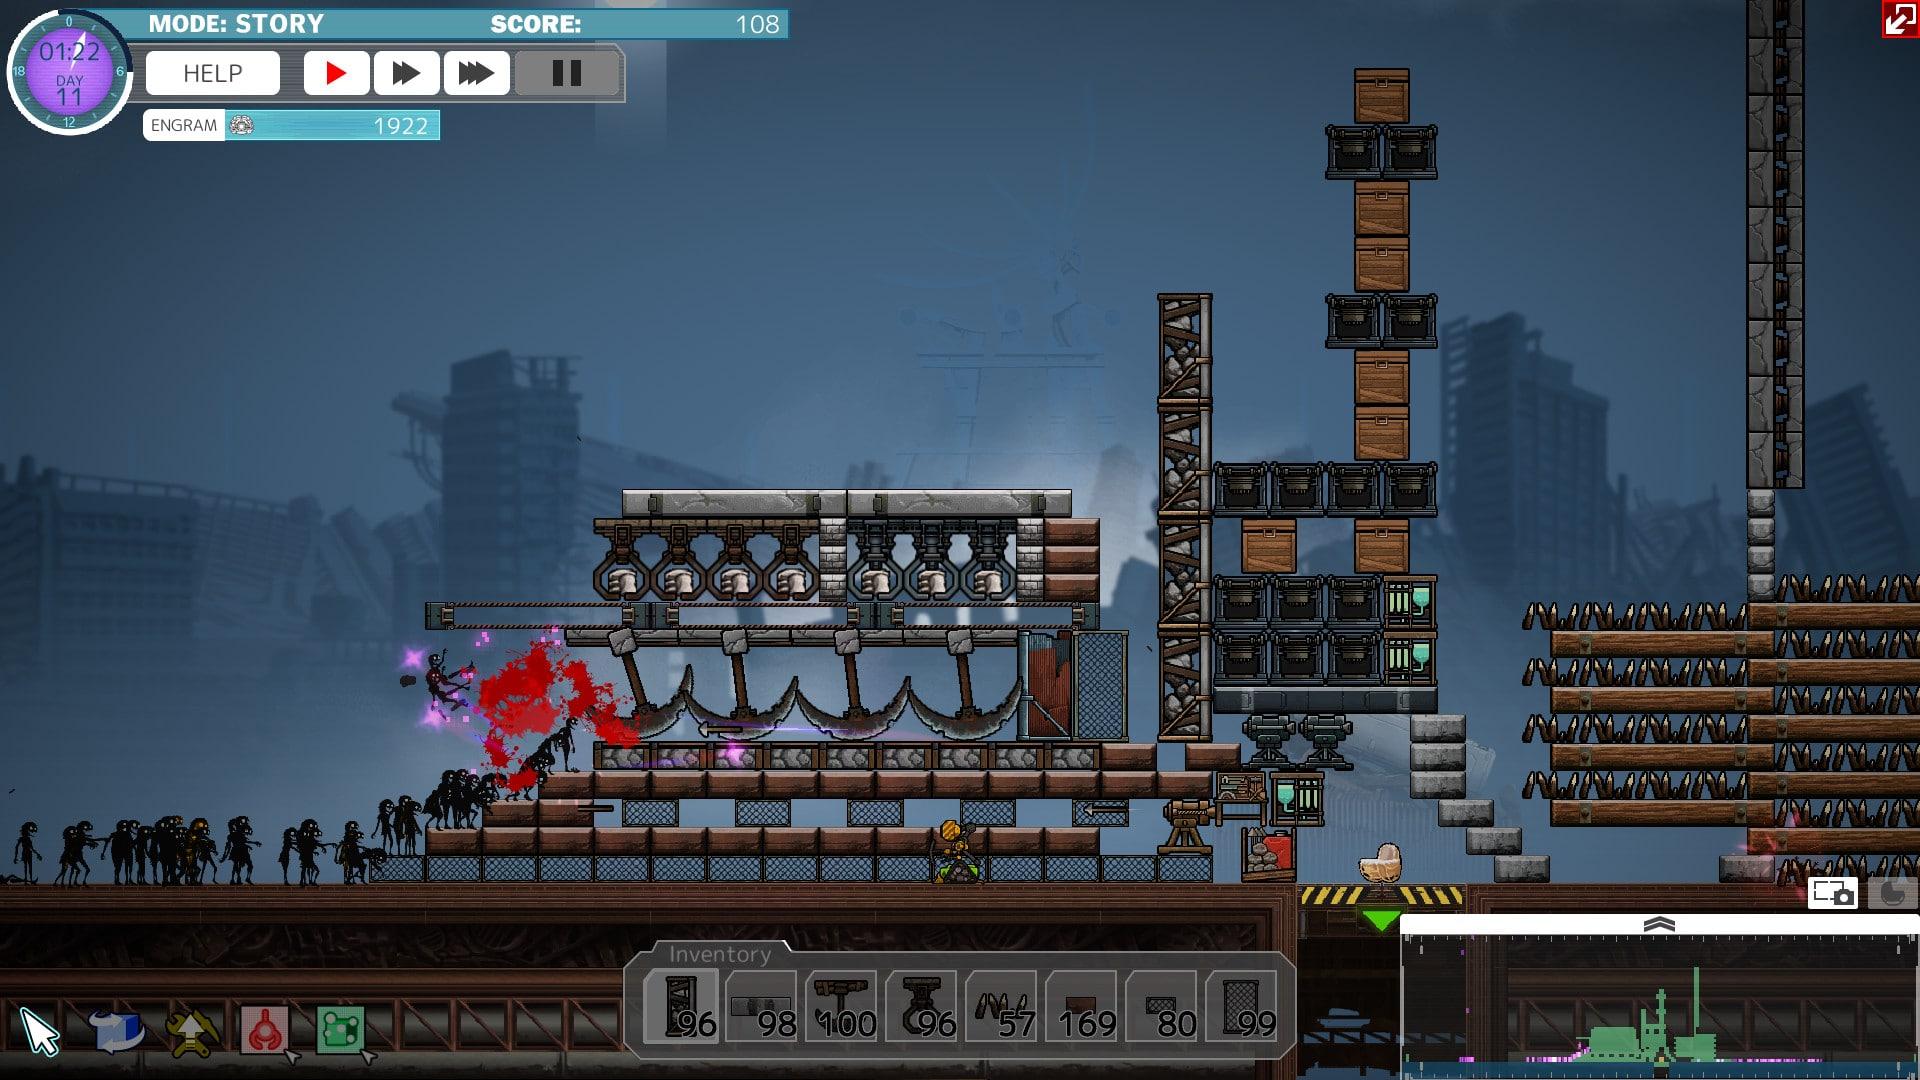 Barricadez - Gameplay